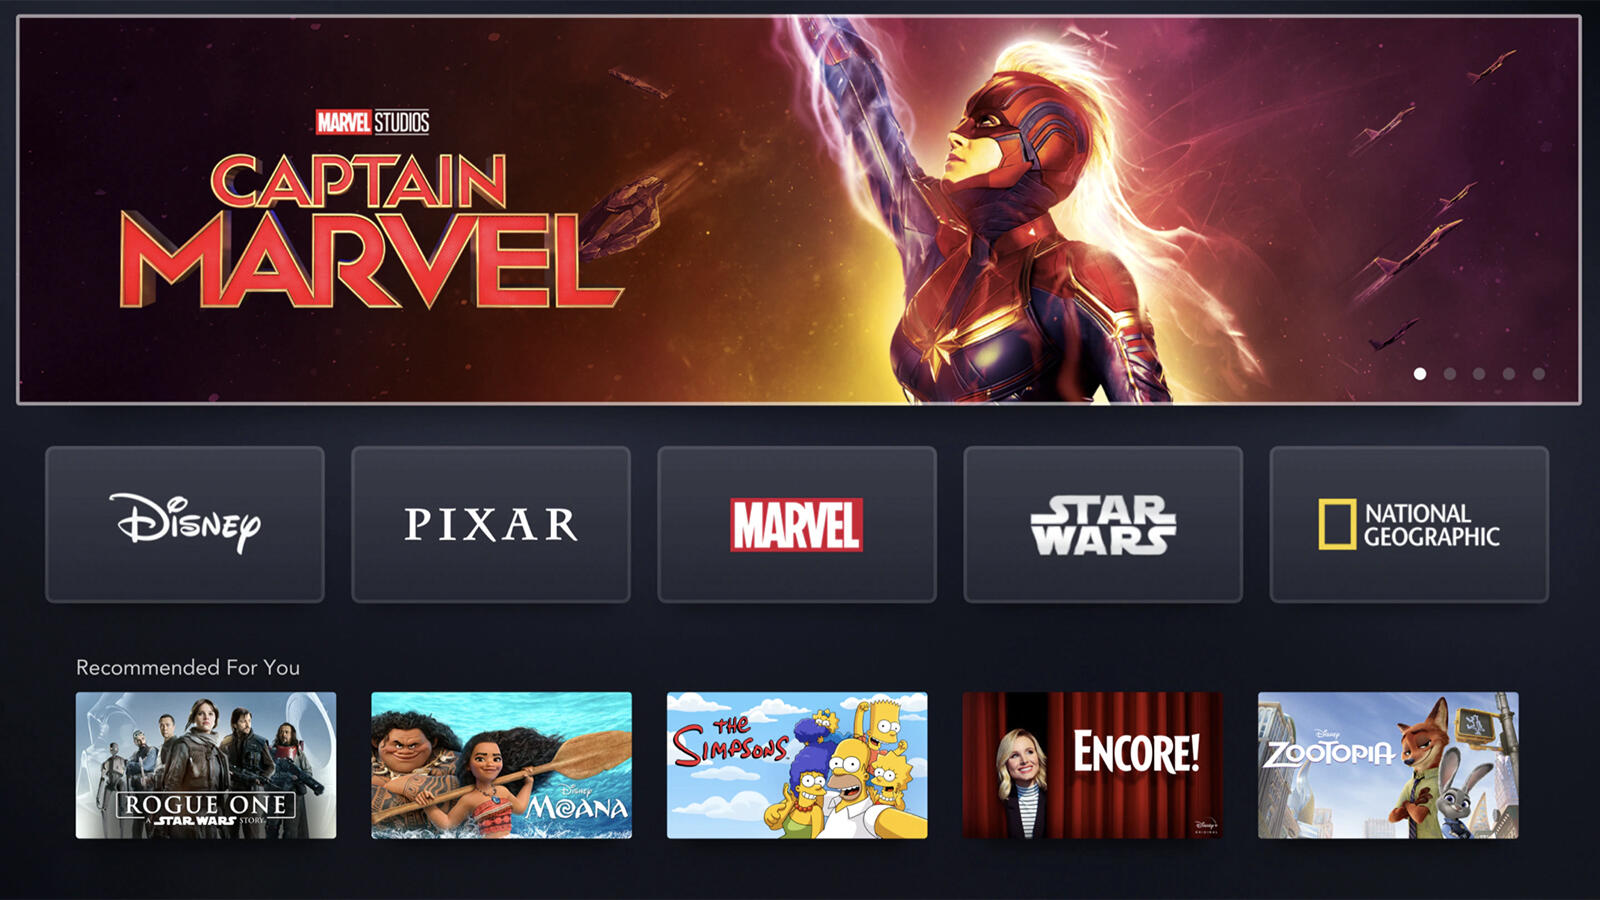 Homescreen of Disney Plus